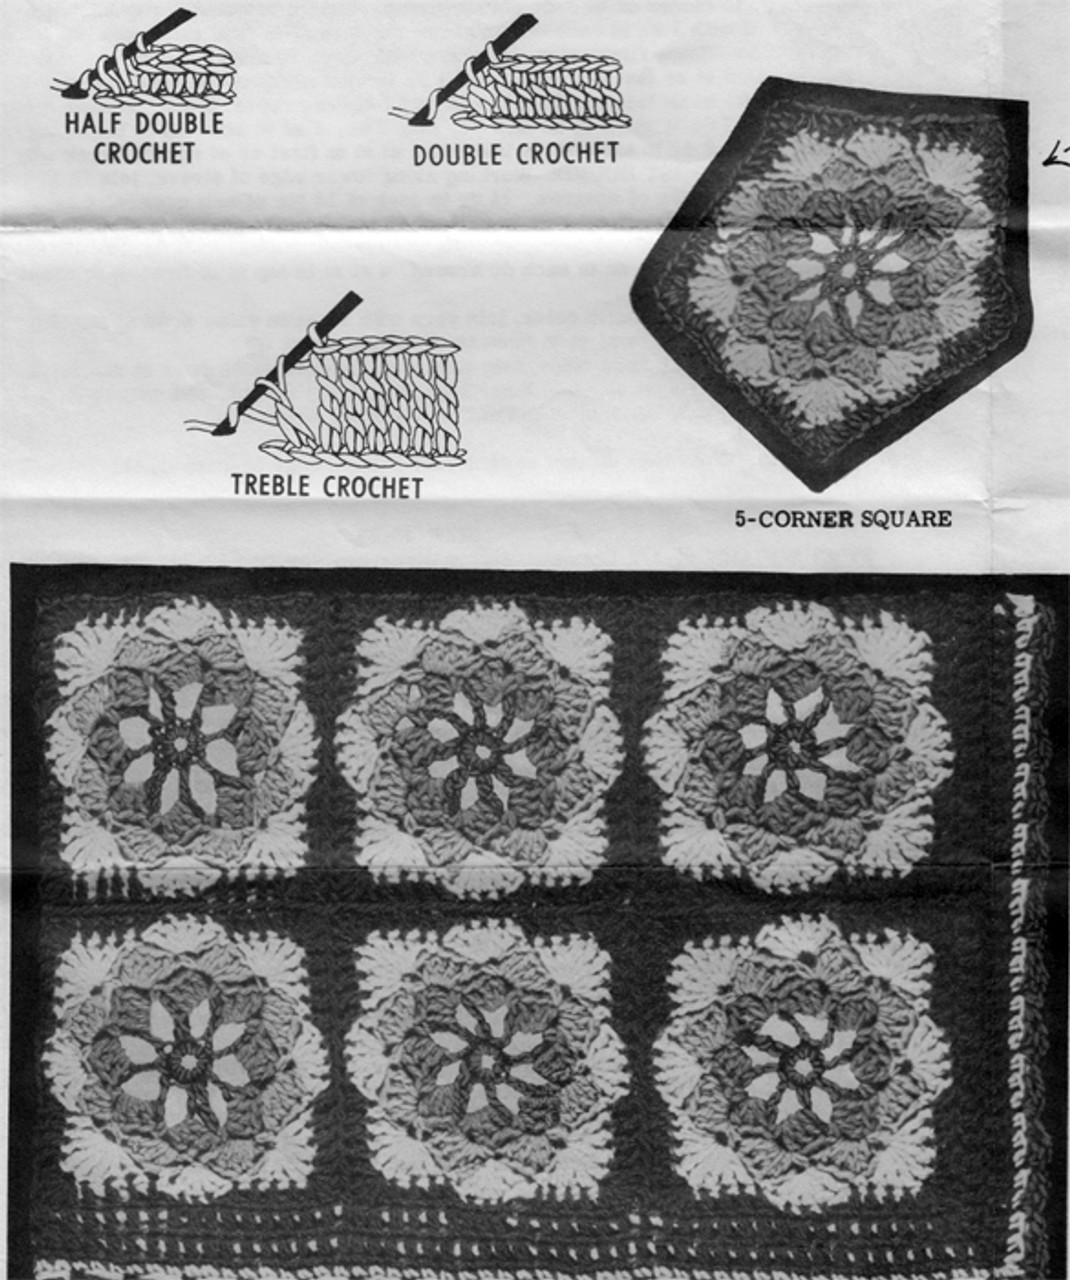 Crochet Medallions Illustration for Granny Square Jacket